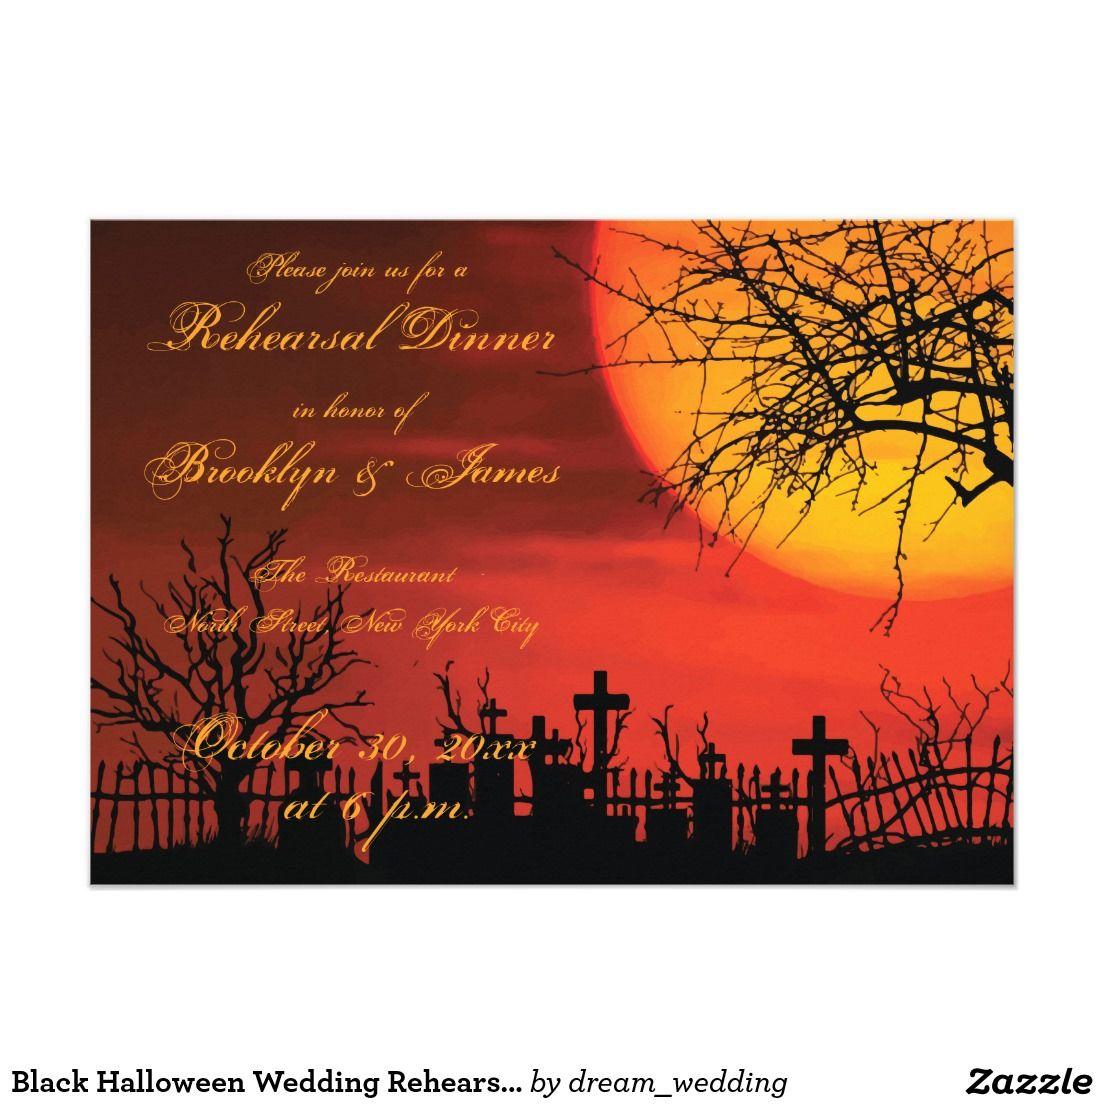 Black halloween wedding rehearsal invitations